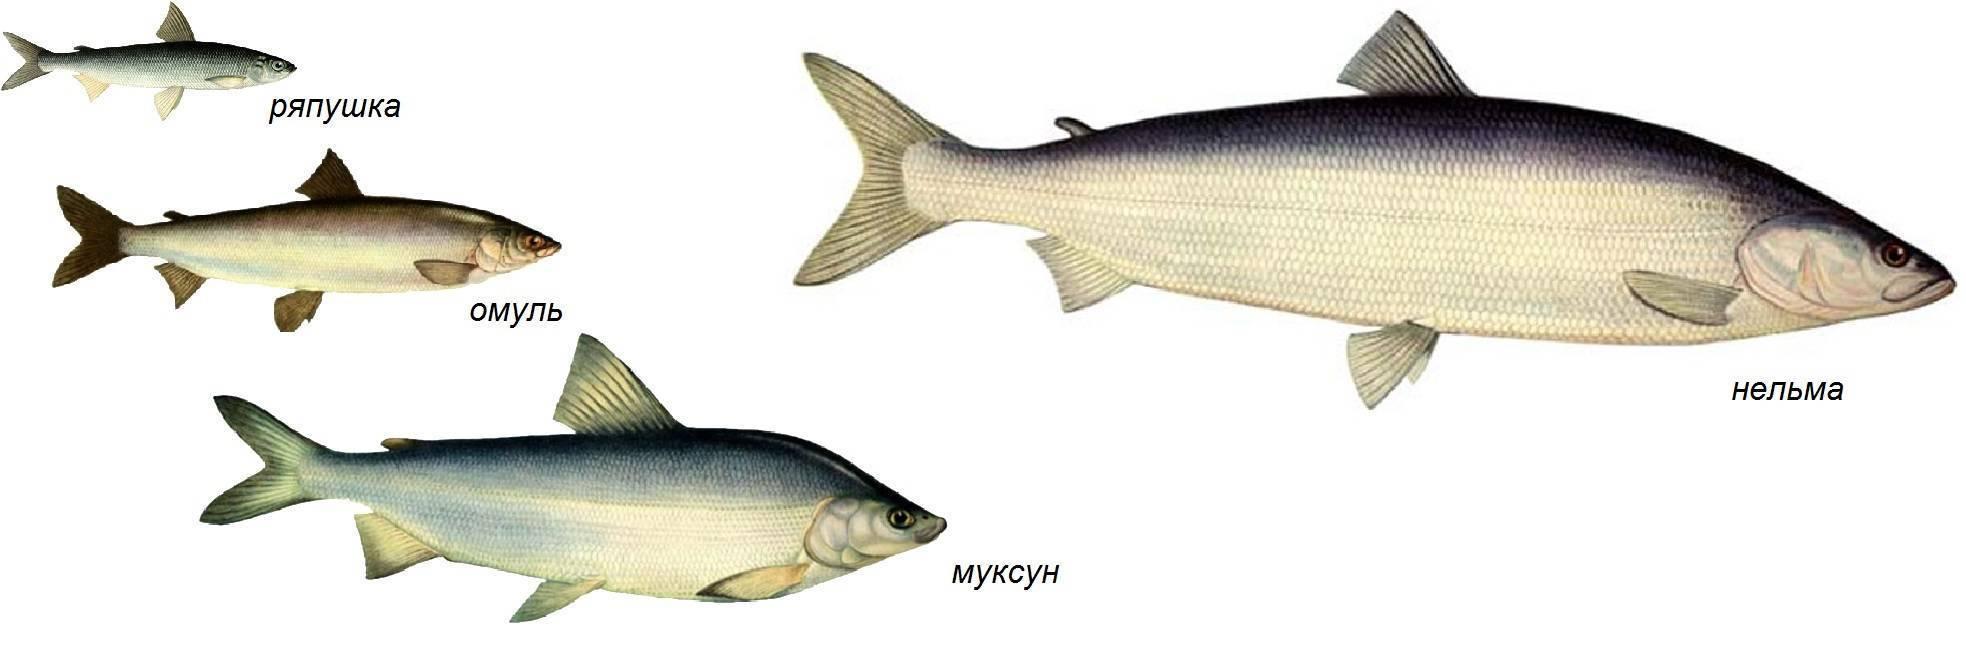 Рыба семейства сиговых — информация о видах рыб ⋆ macho's rules